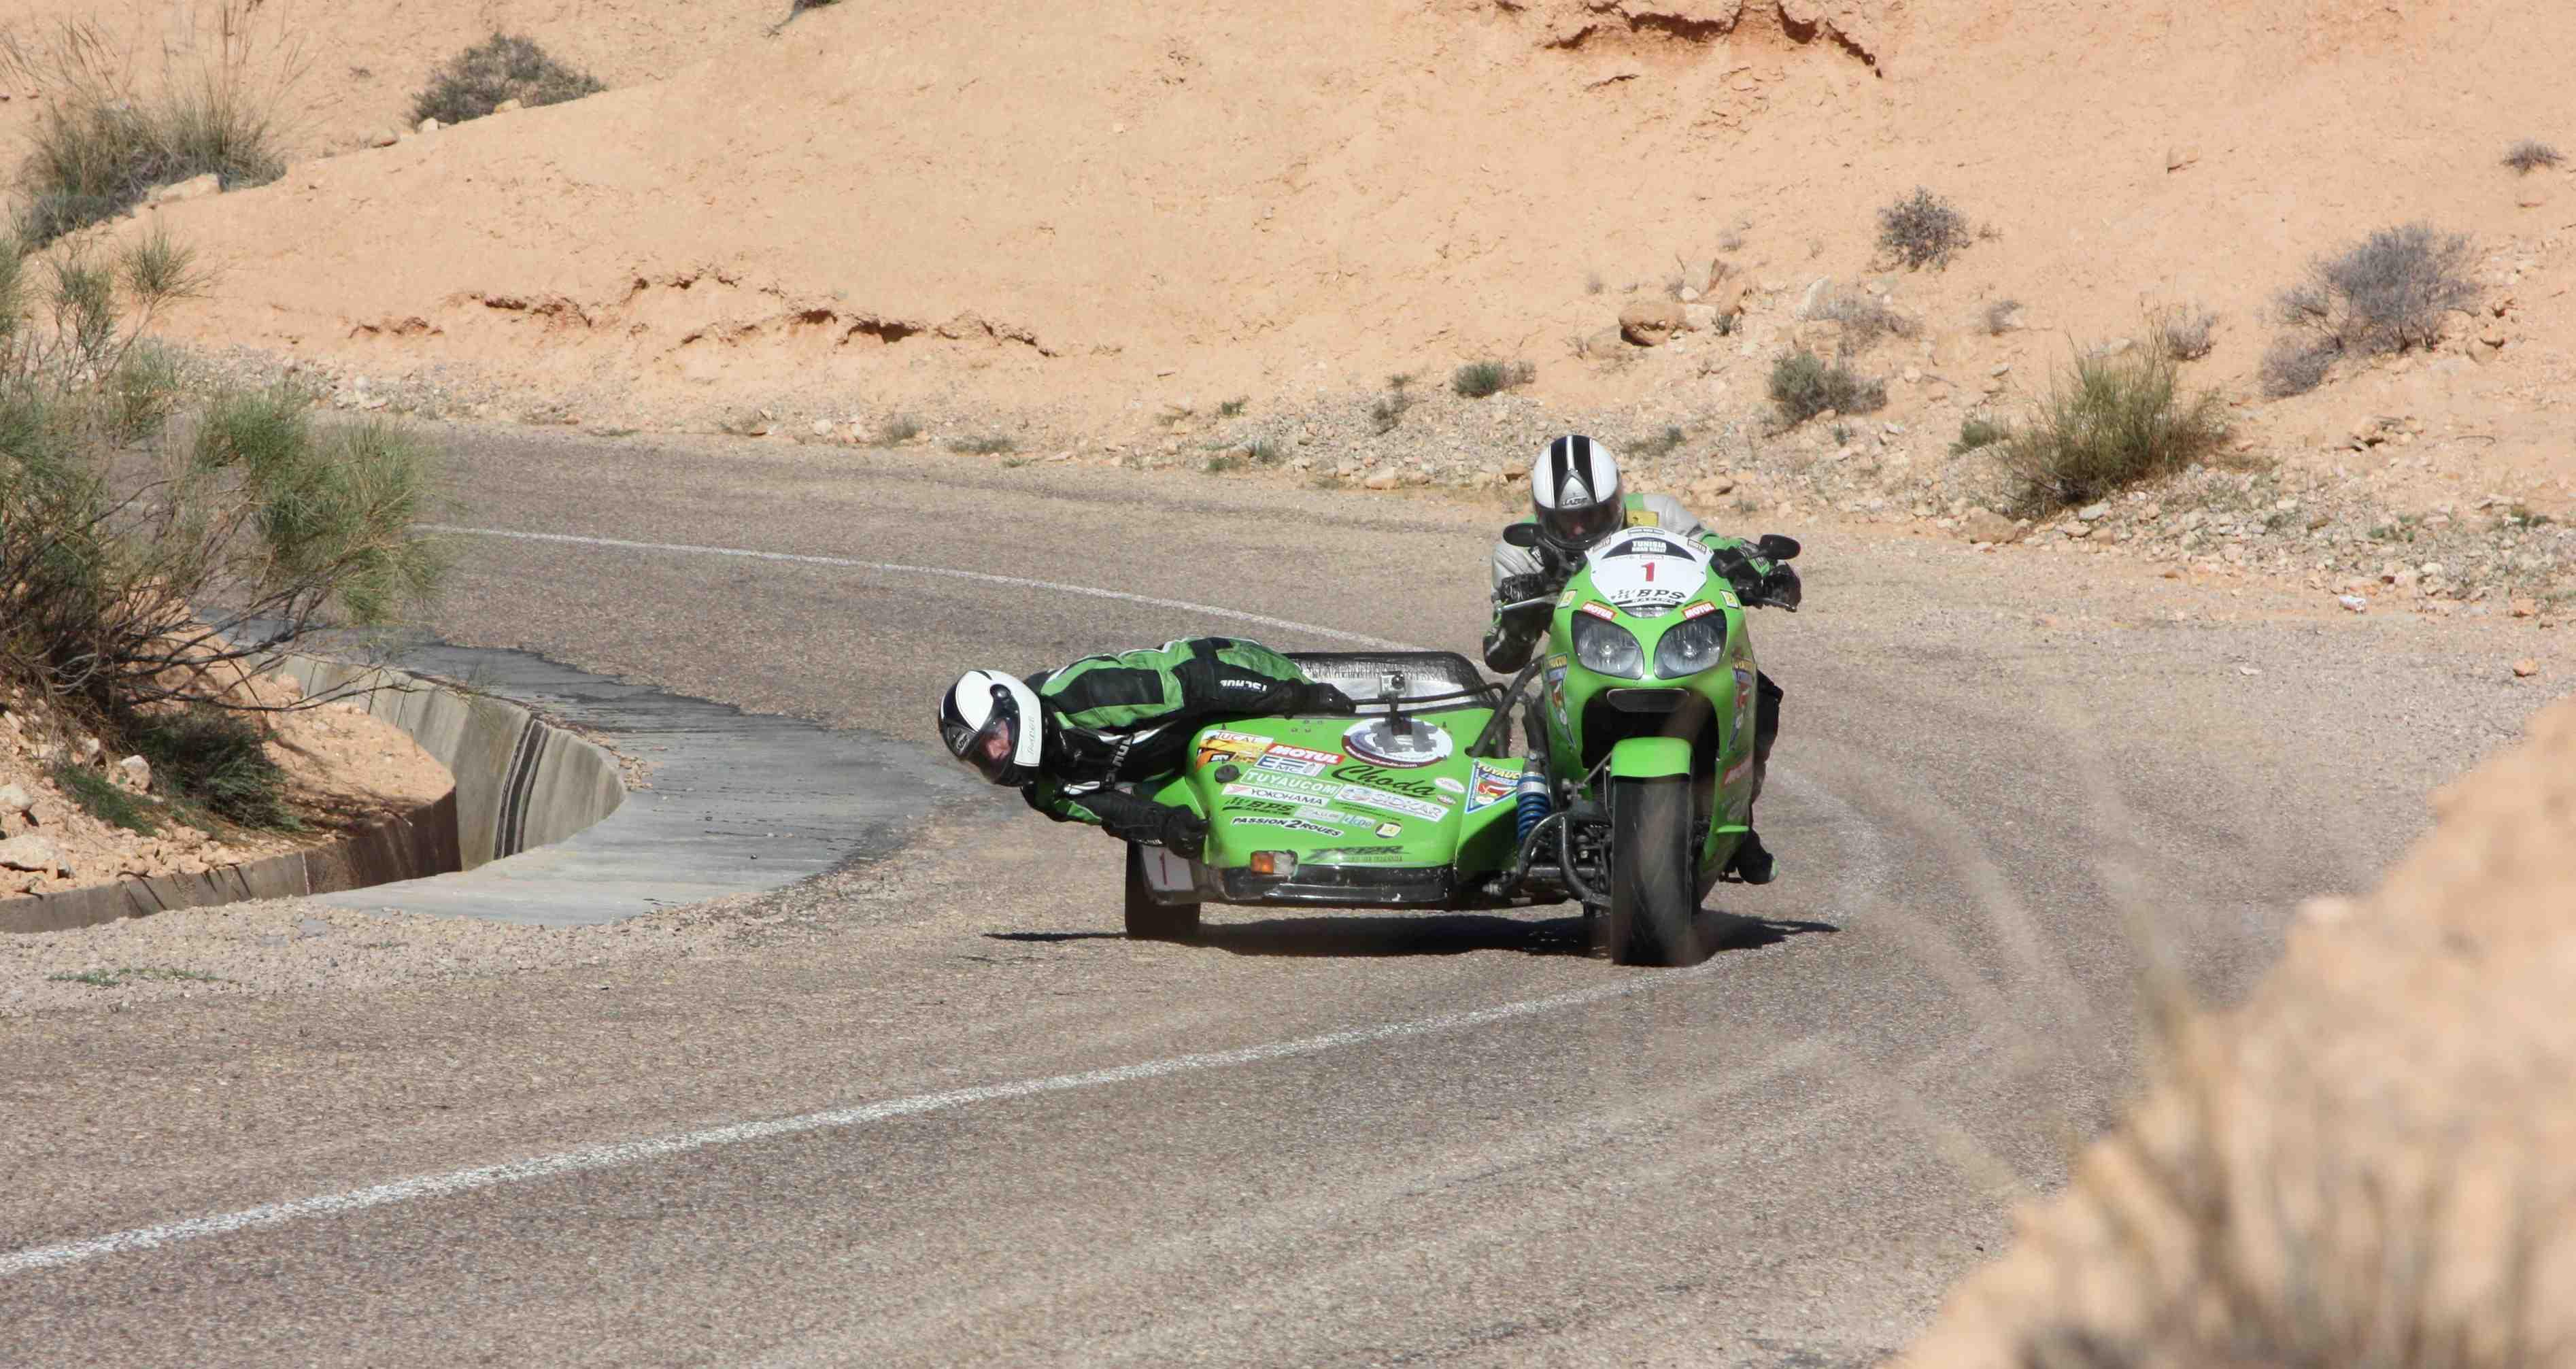 le Tunisia Road Rally - Page 2 6a00d8341d0c3a53ef0154367e38ce970c-pi